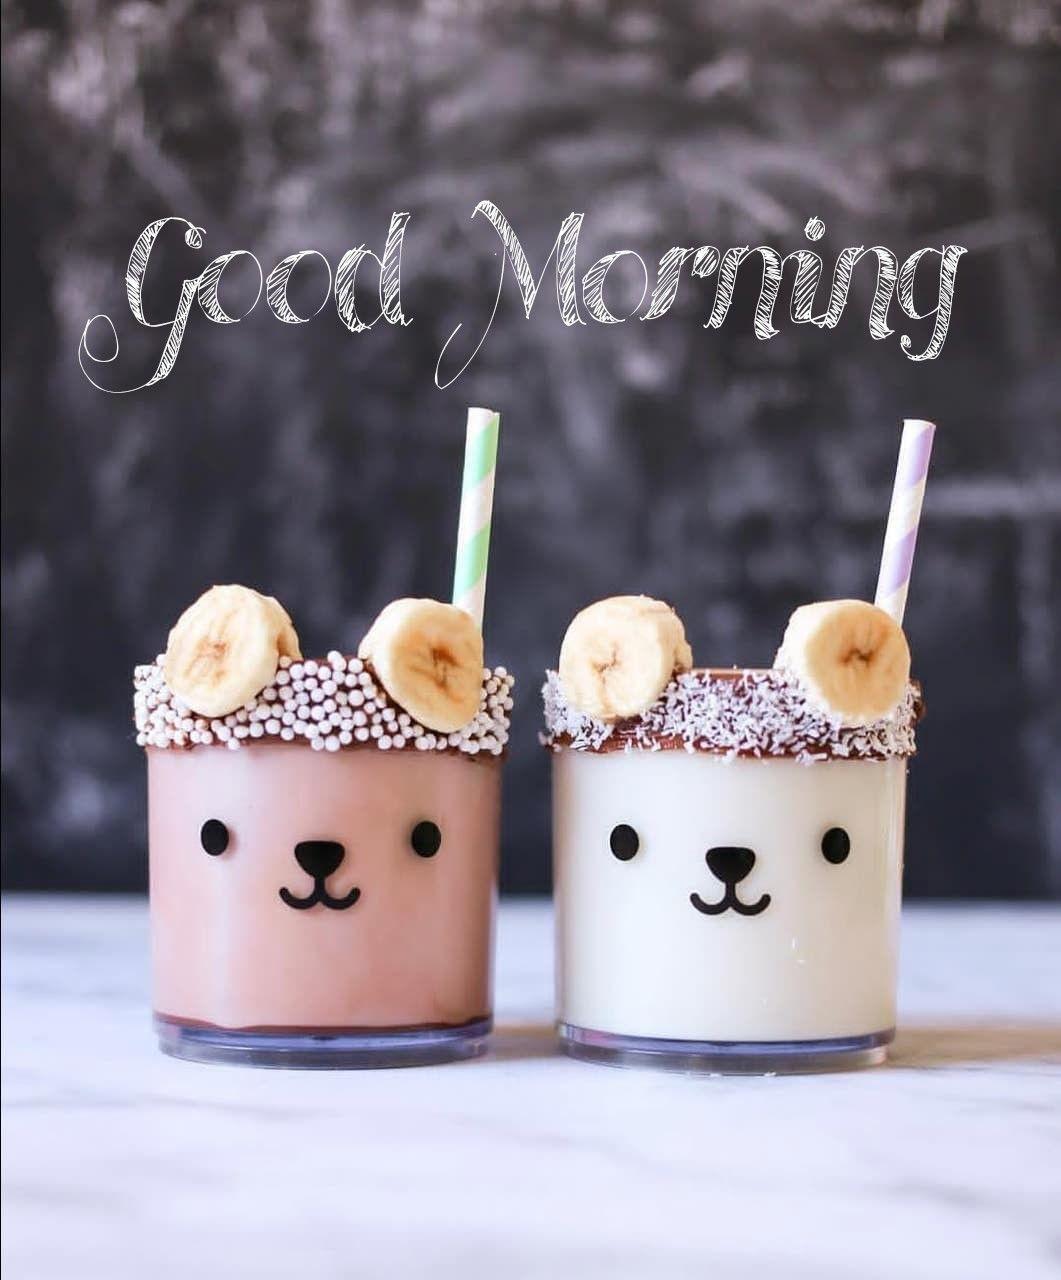 Pin by cutipieanu on good morning pinterest good morning